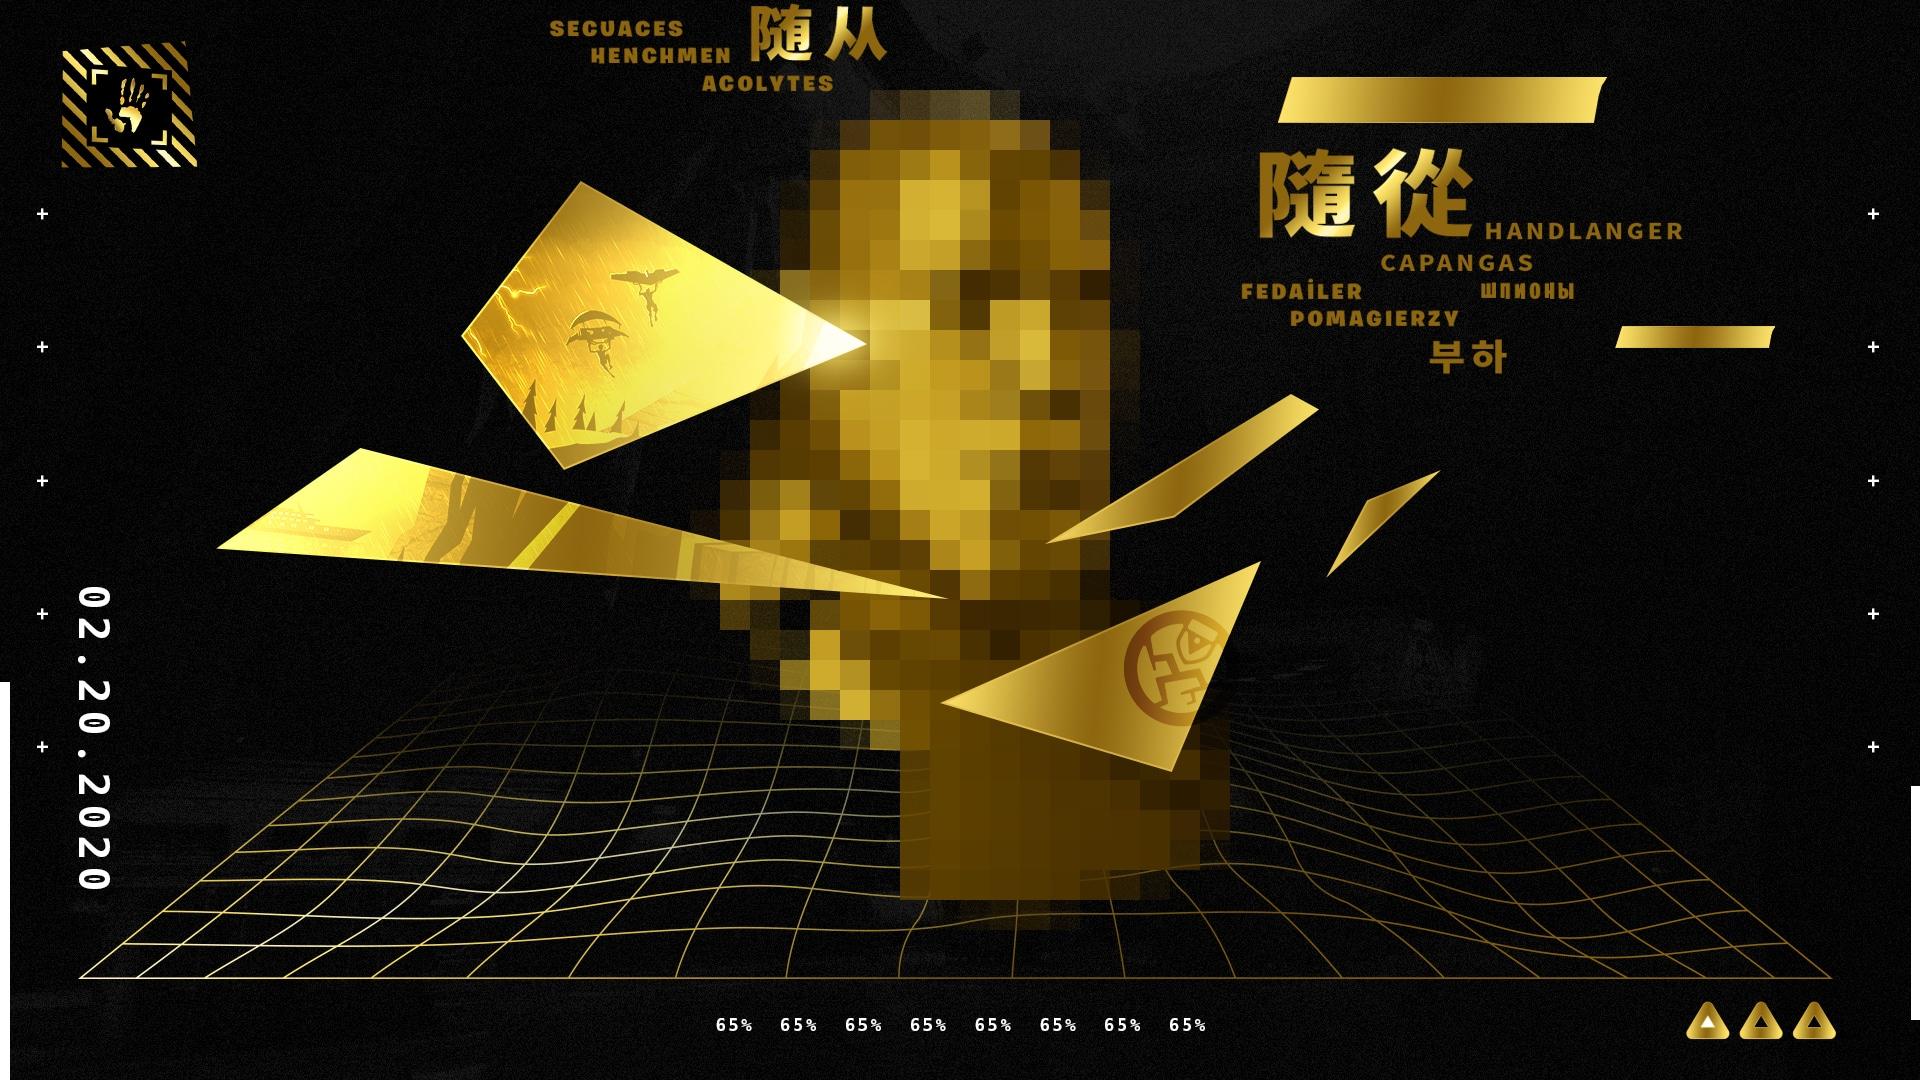 Fortnite Chapter 2 Season 2 Teaser 3 Image Revealed - Ship, Pyramid and More - Fortnite Insider